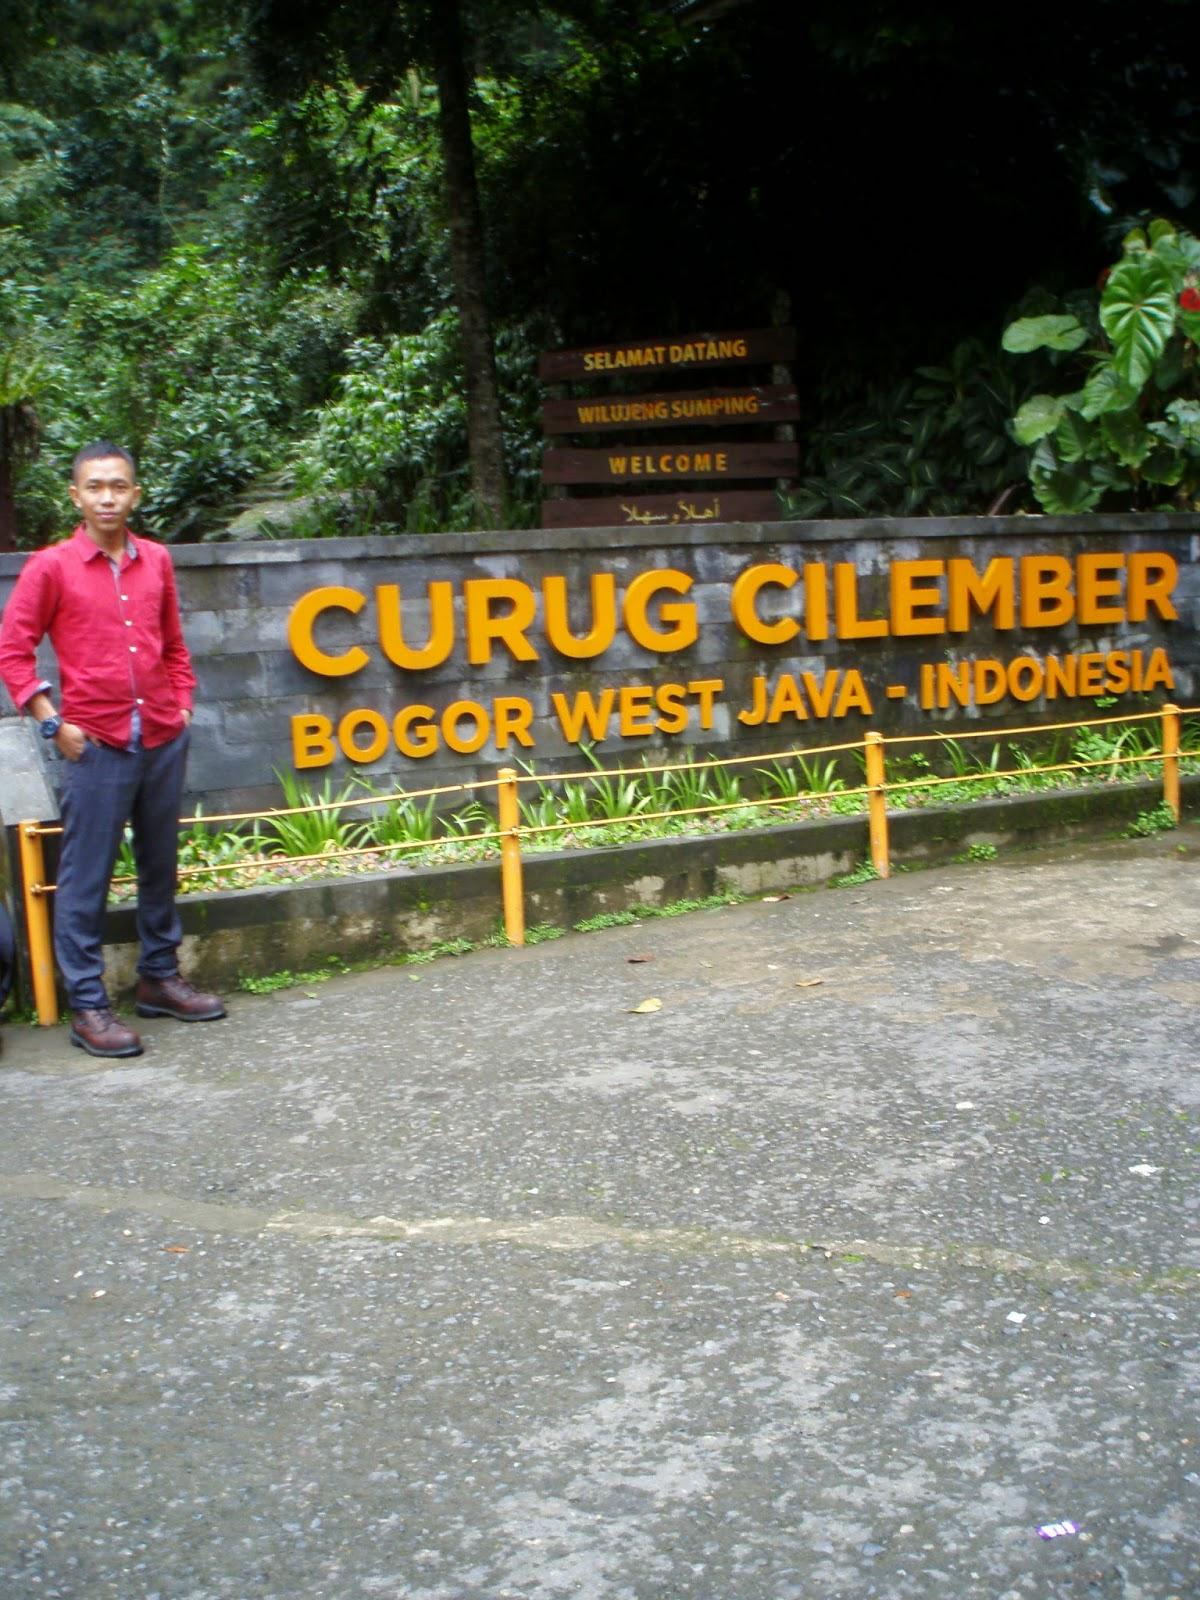 Berkunjung ke Curug Cilember Bogor Jawa Barat